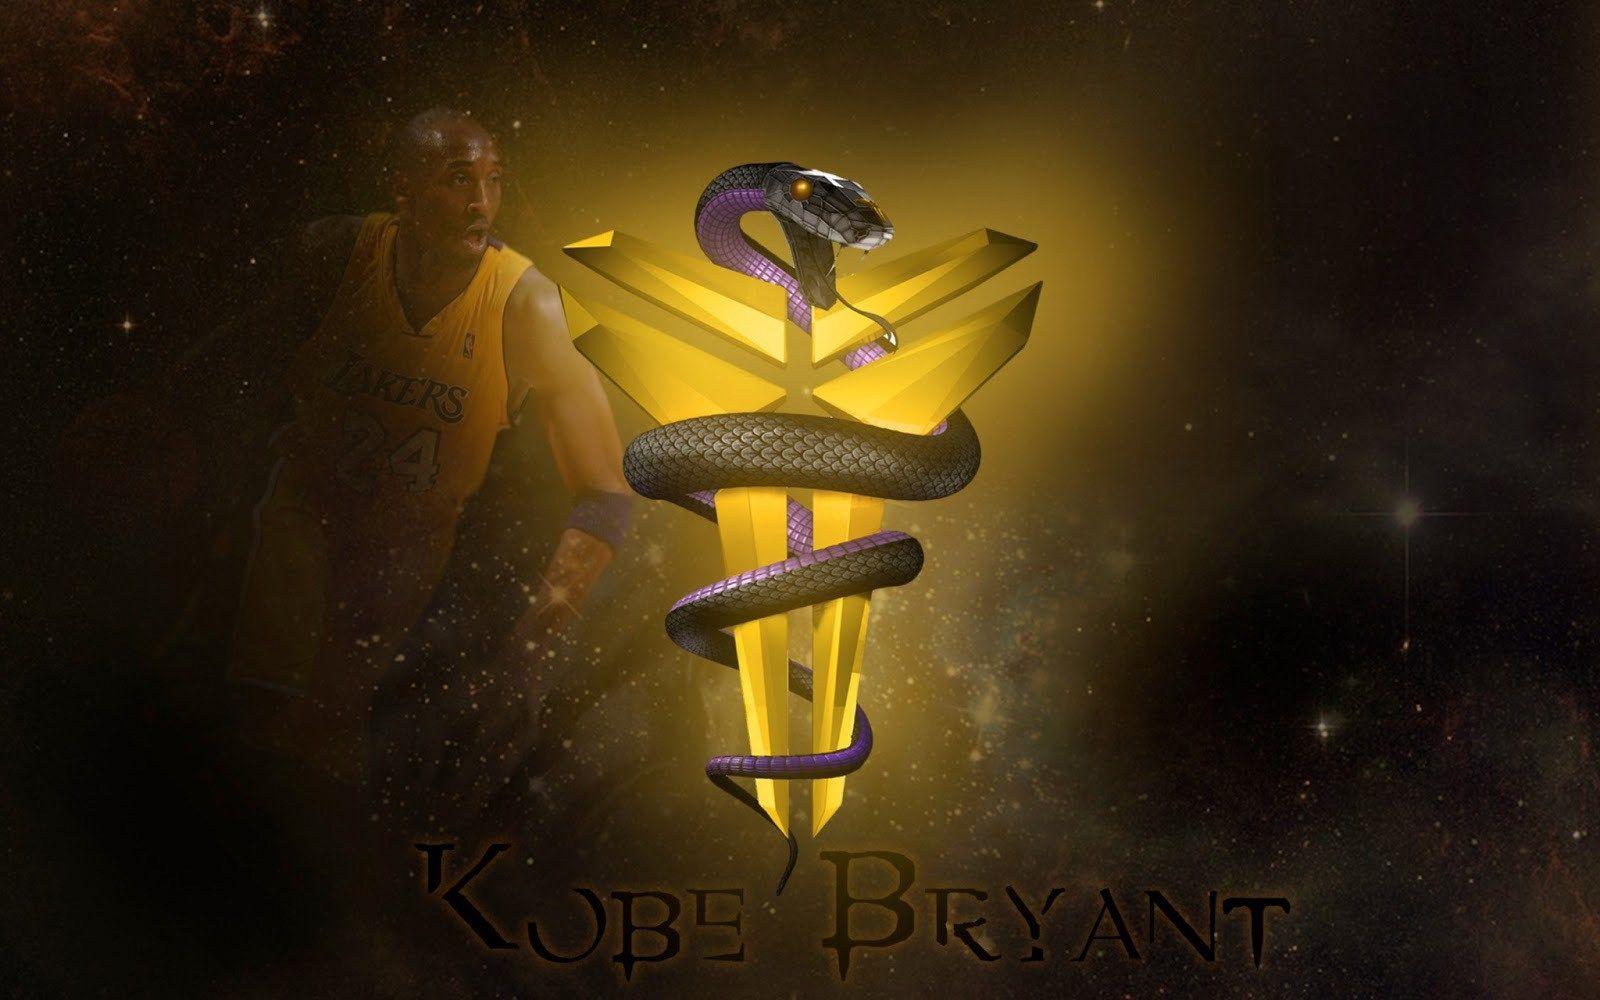 kobe bryant Kobe bryant black mamba, Kobe bryant